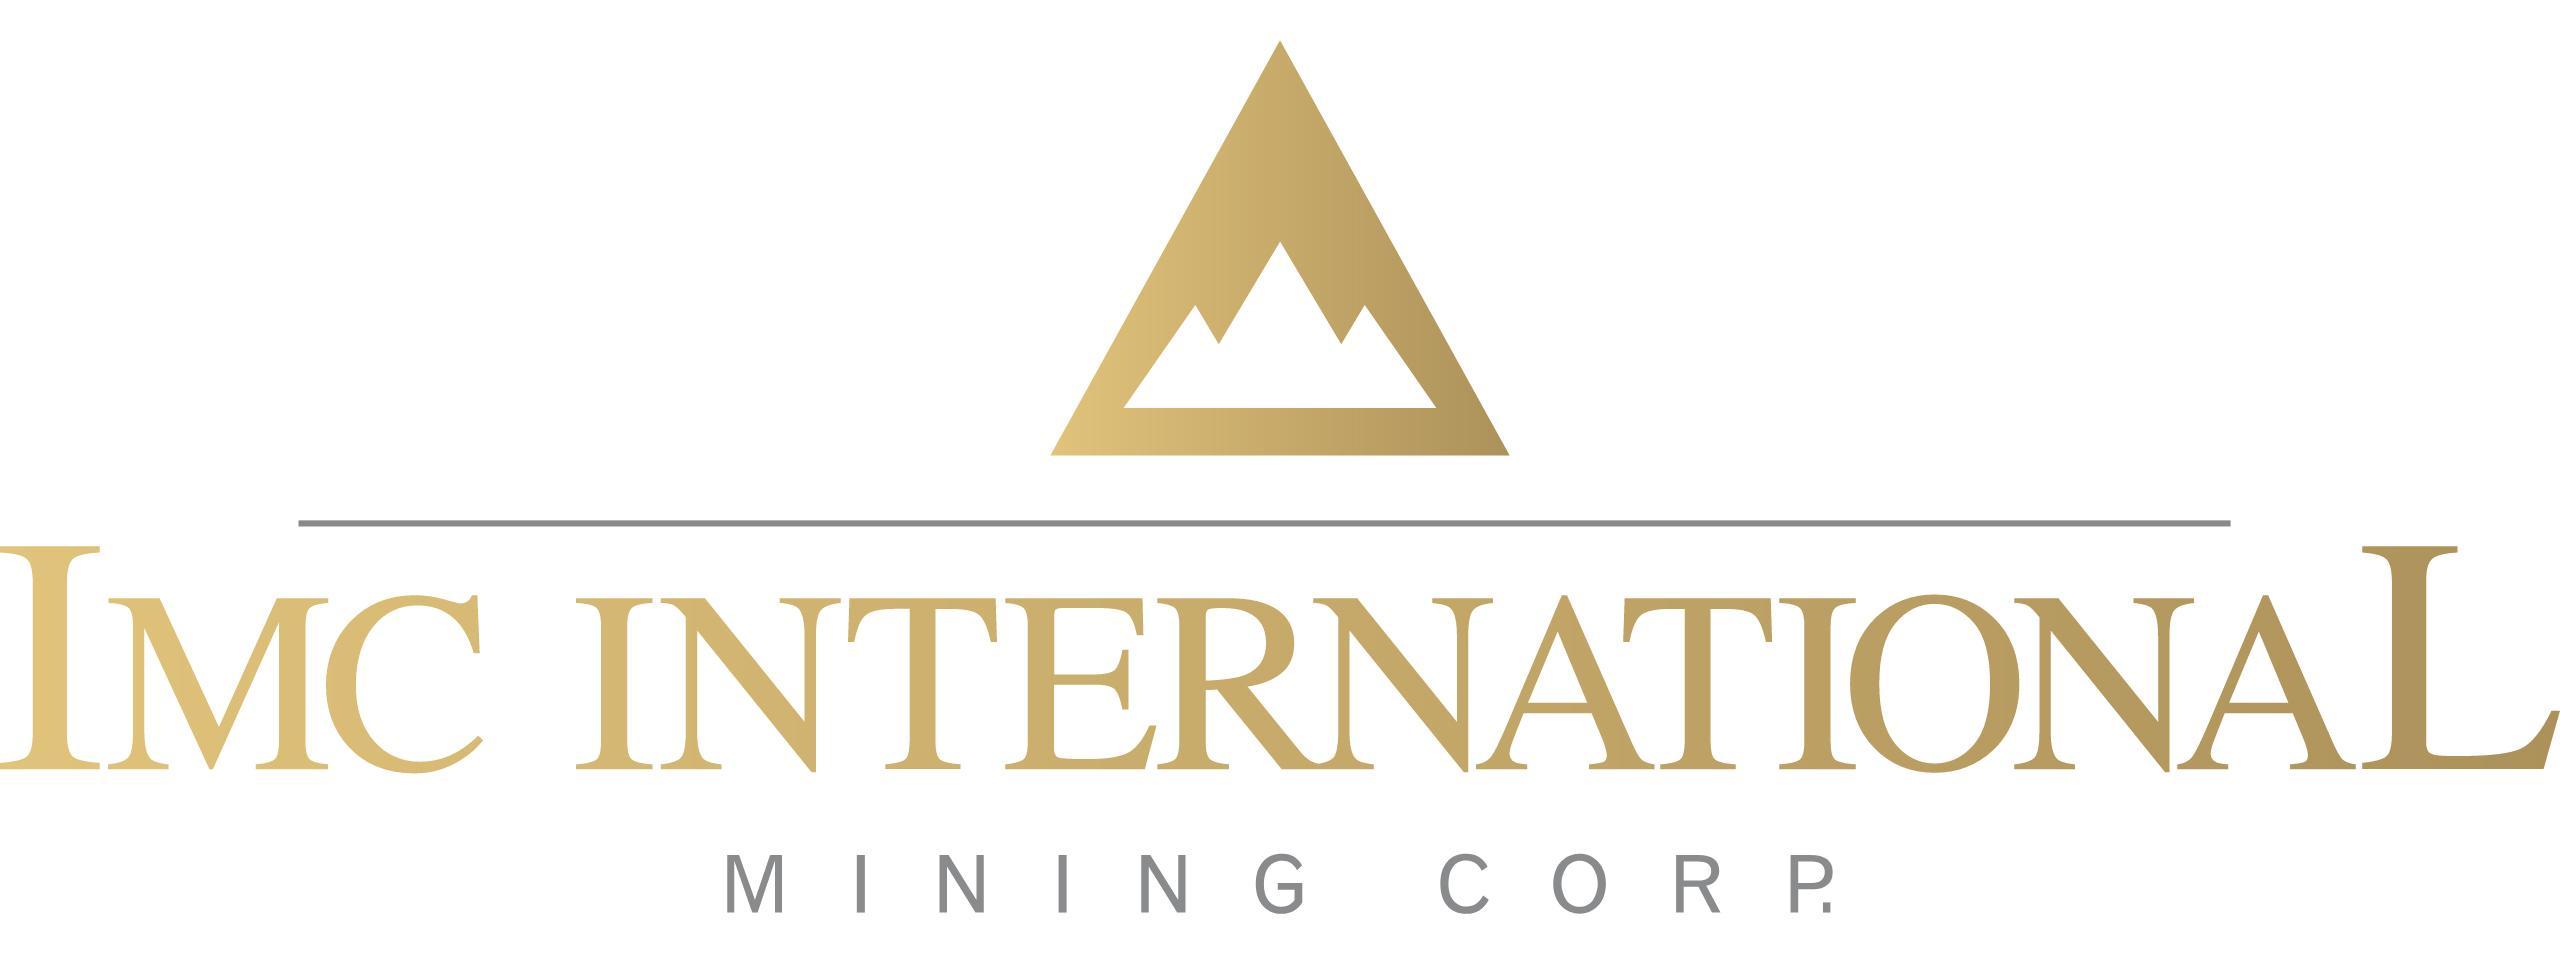 IMC International Mining company logo